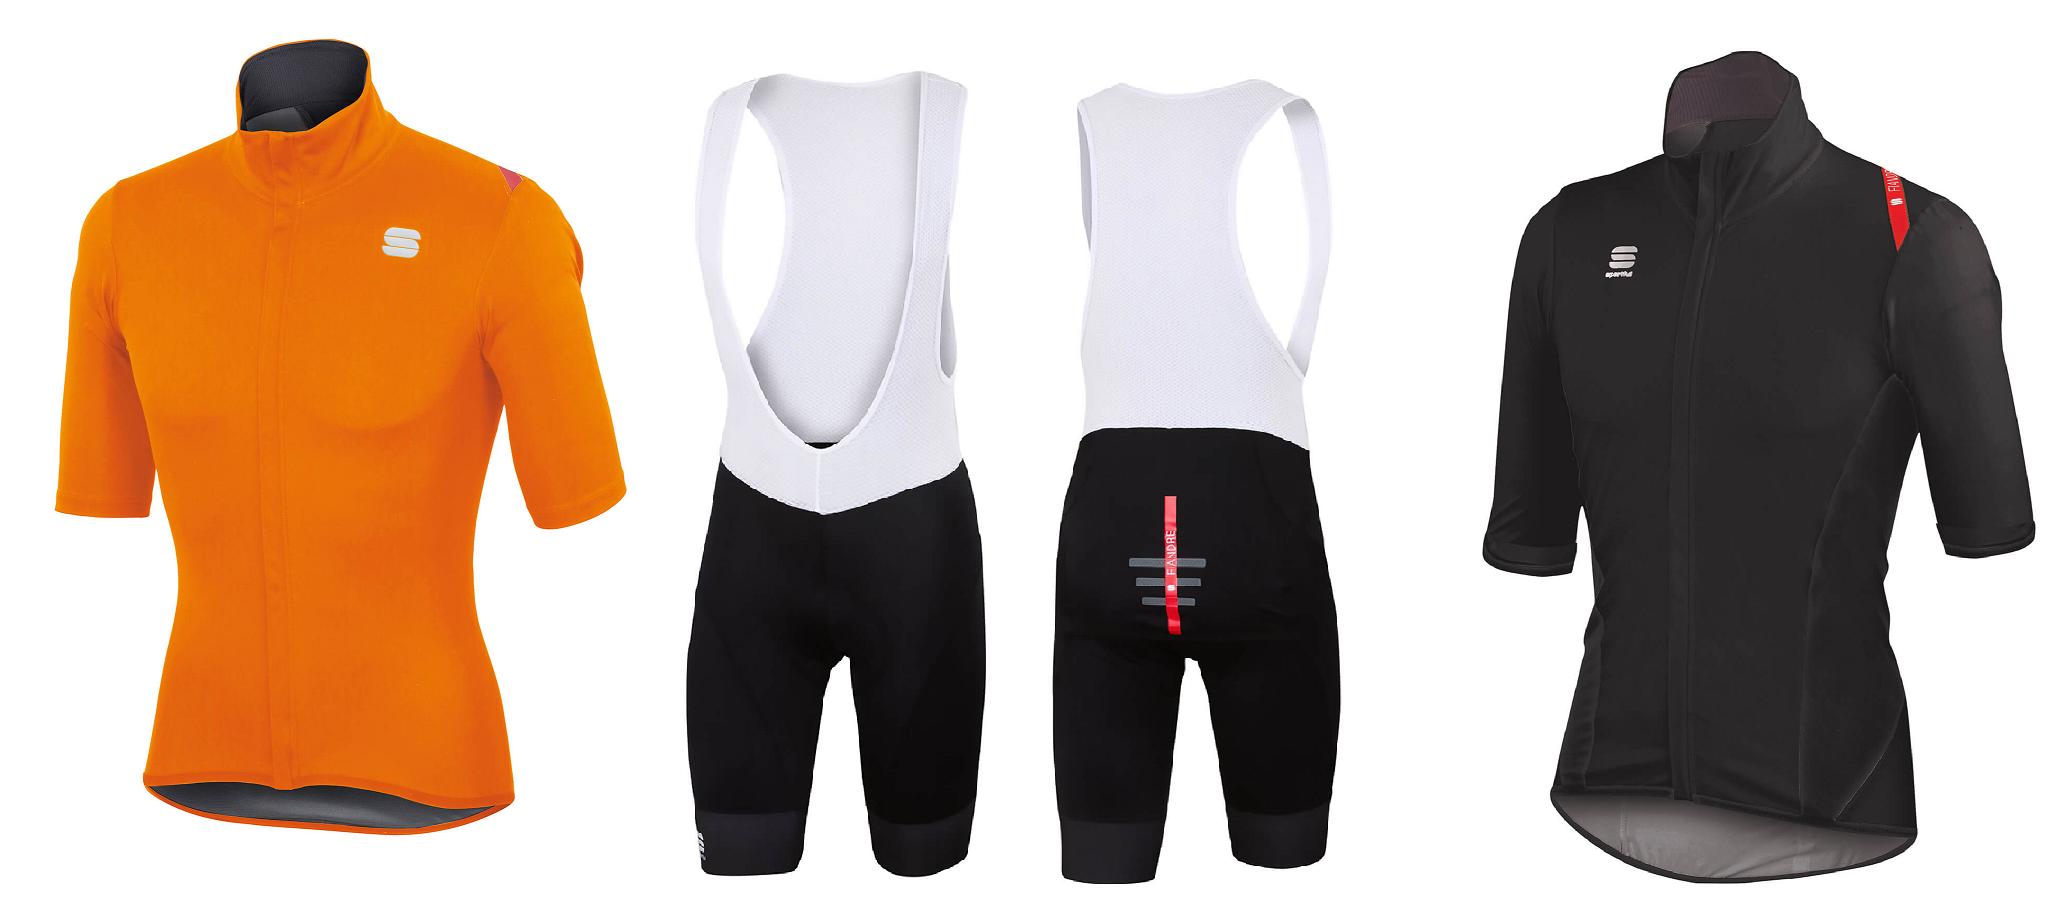 the sportful fiandre norain jersey and shorts bundle